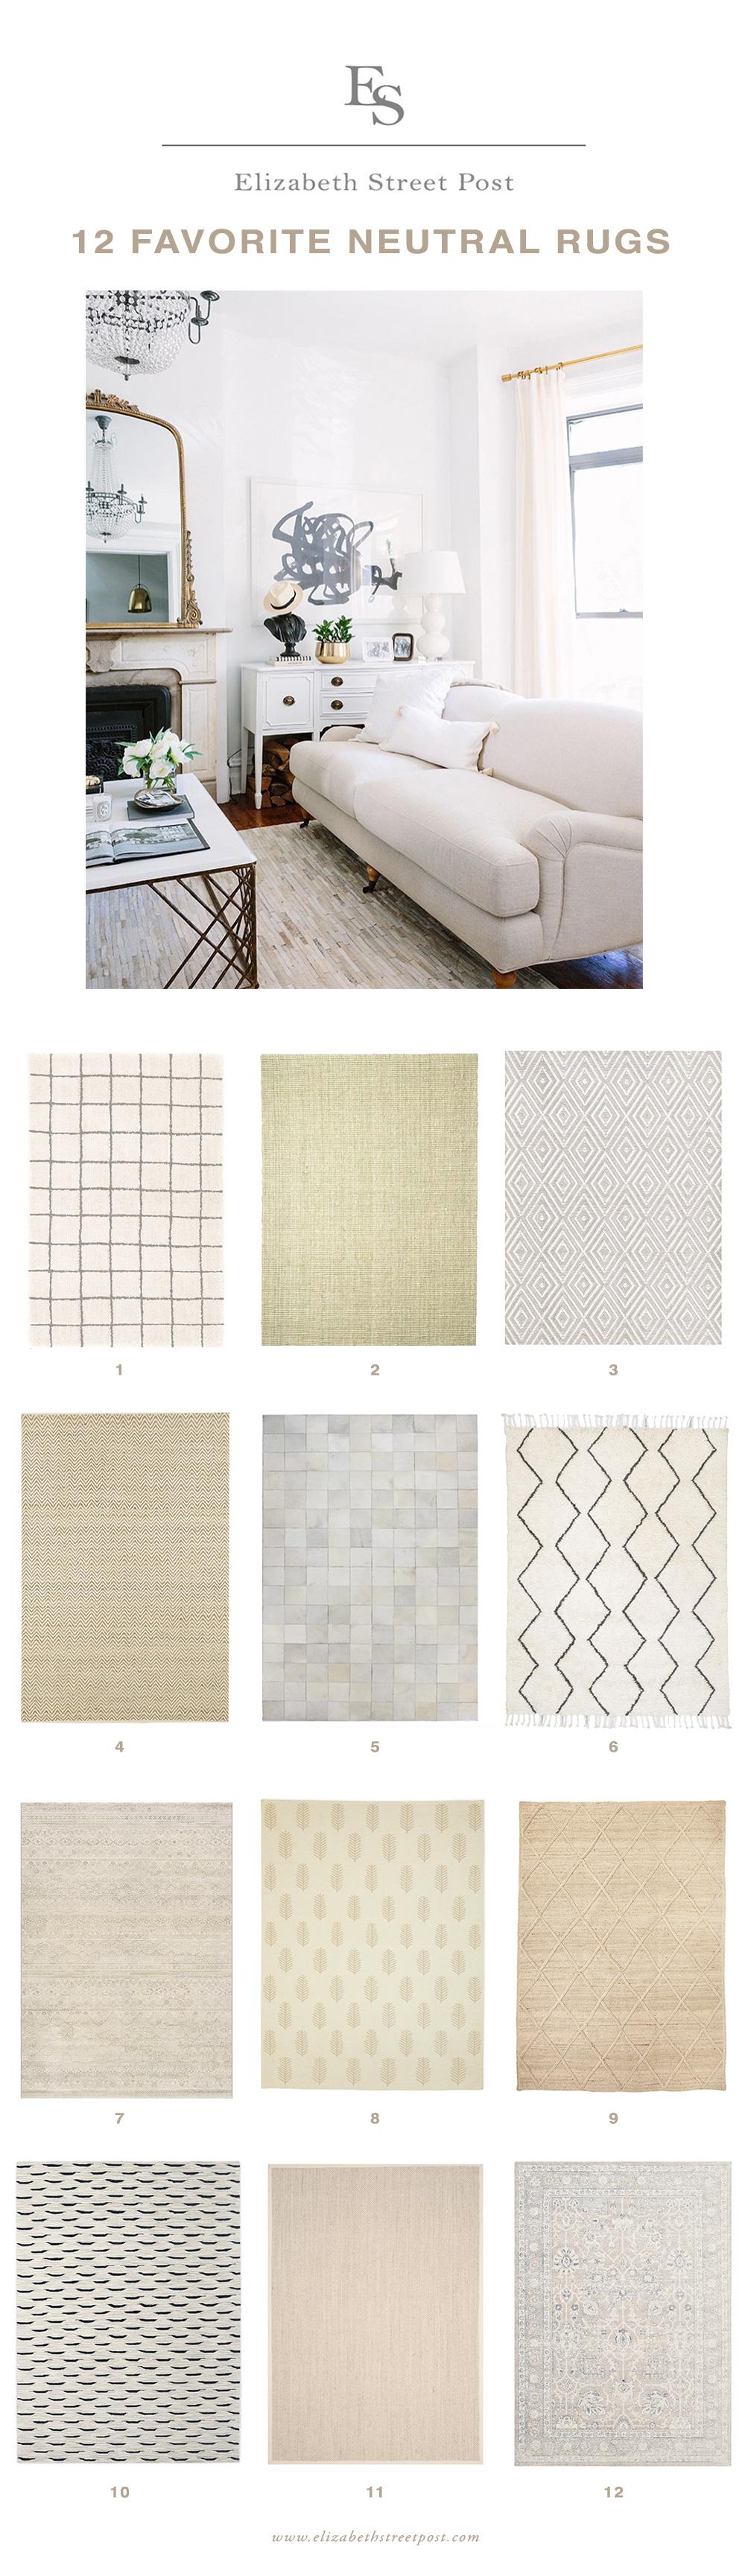 my 12 favorite failproof area rugs – elizabeth street post Best Neutral Rugs